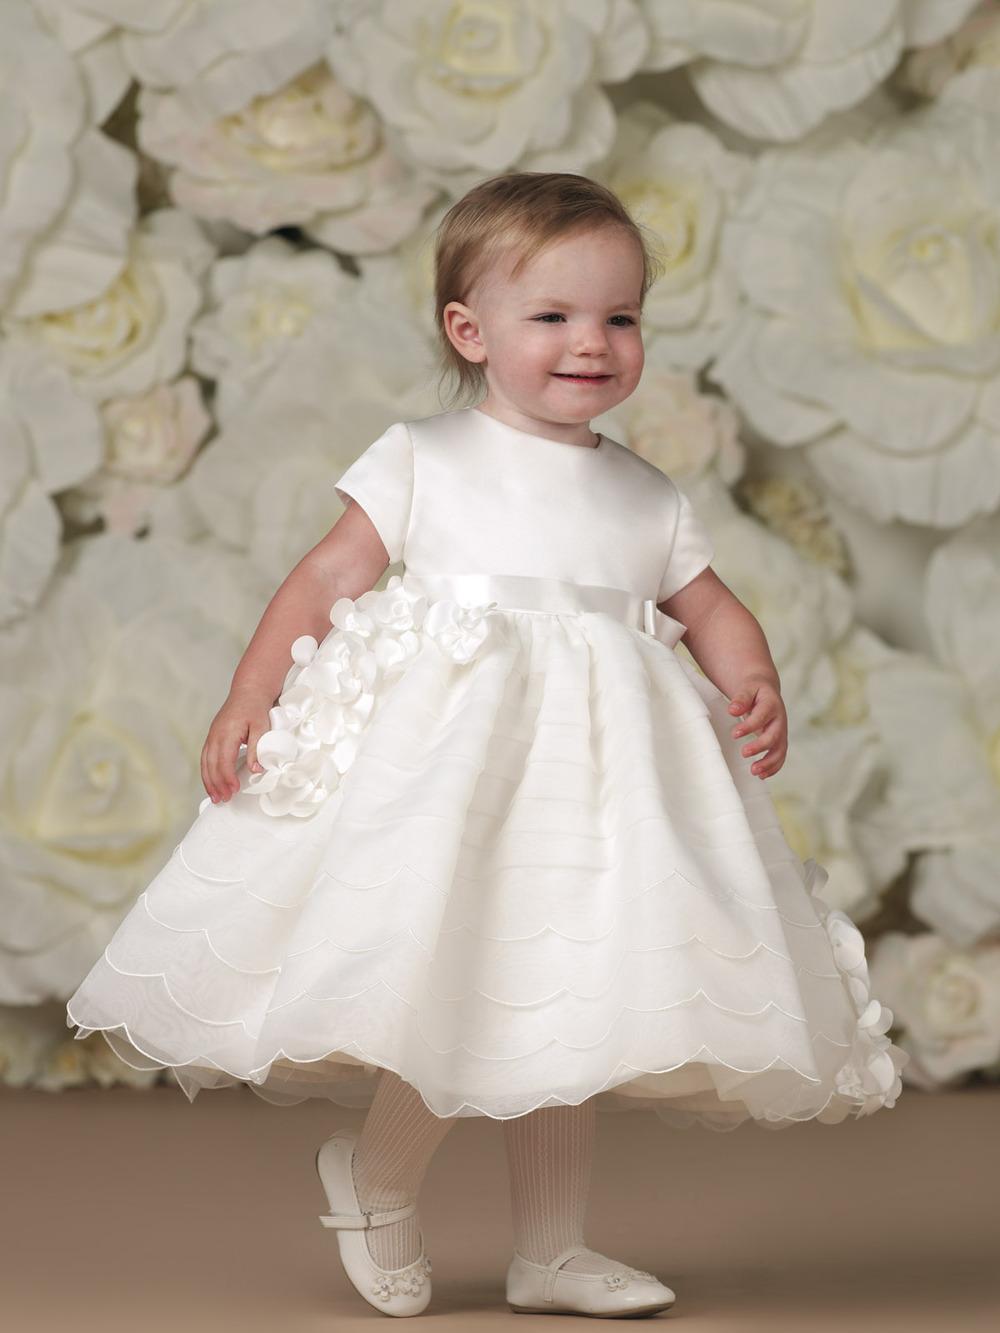 Incredible Calabrese Girl Dress Communion 1000 x 1333 · 196 kB · jpeg